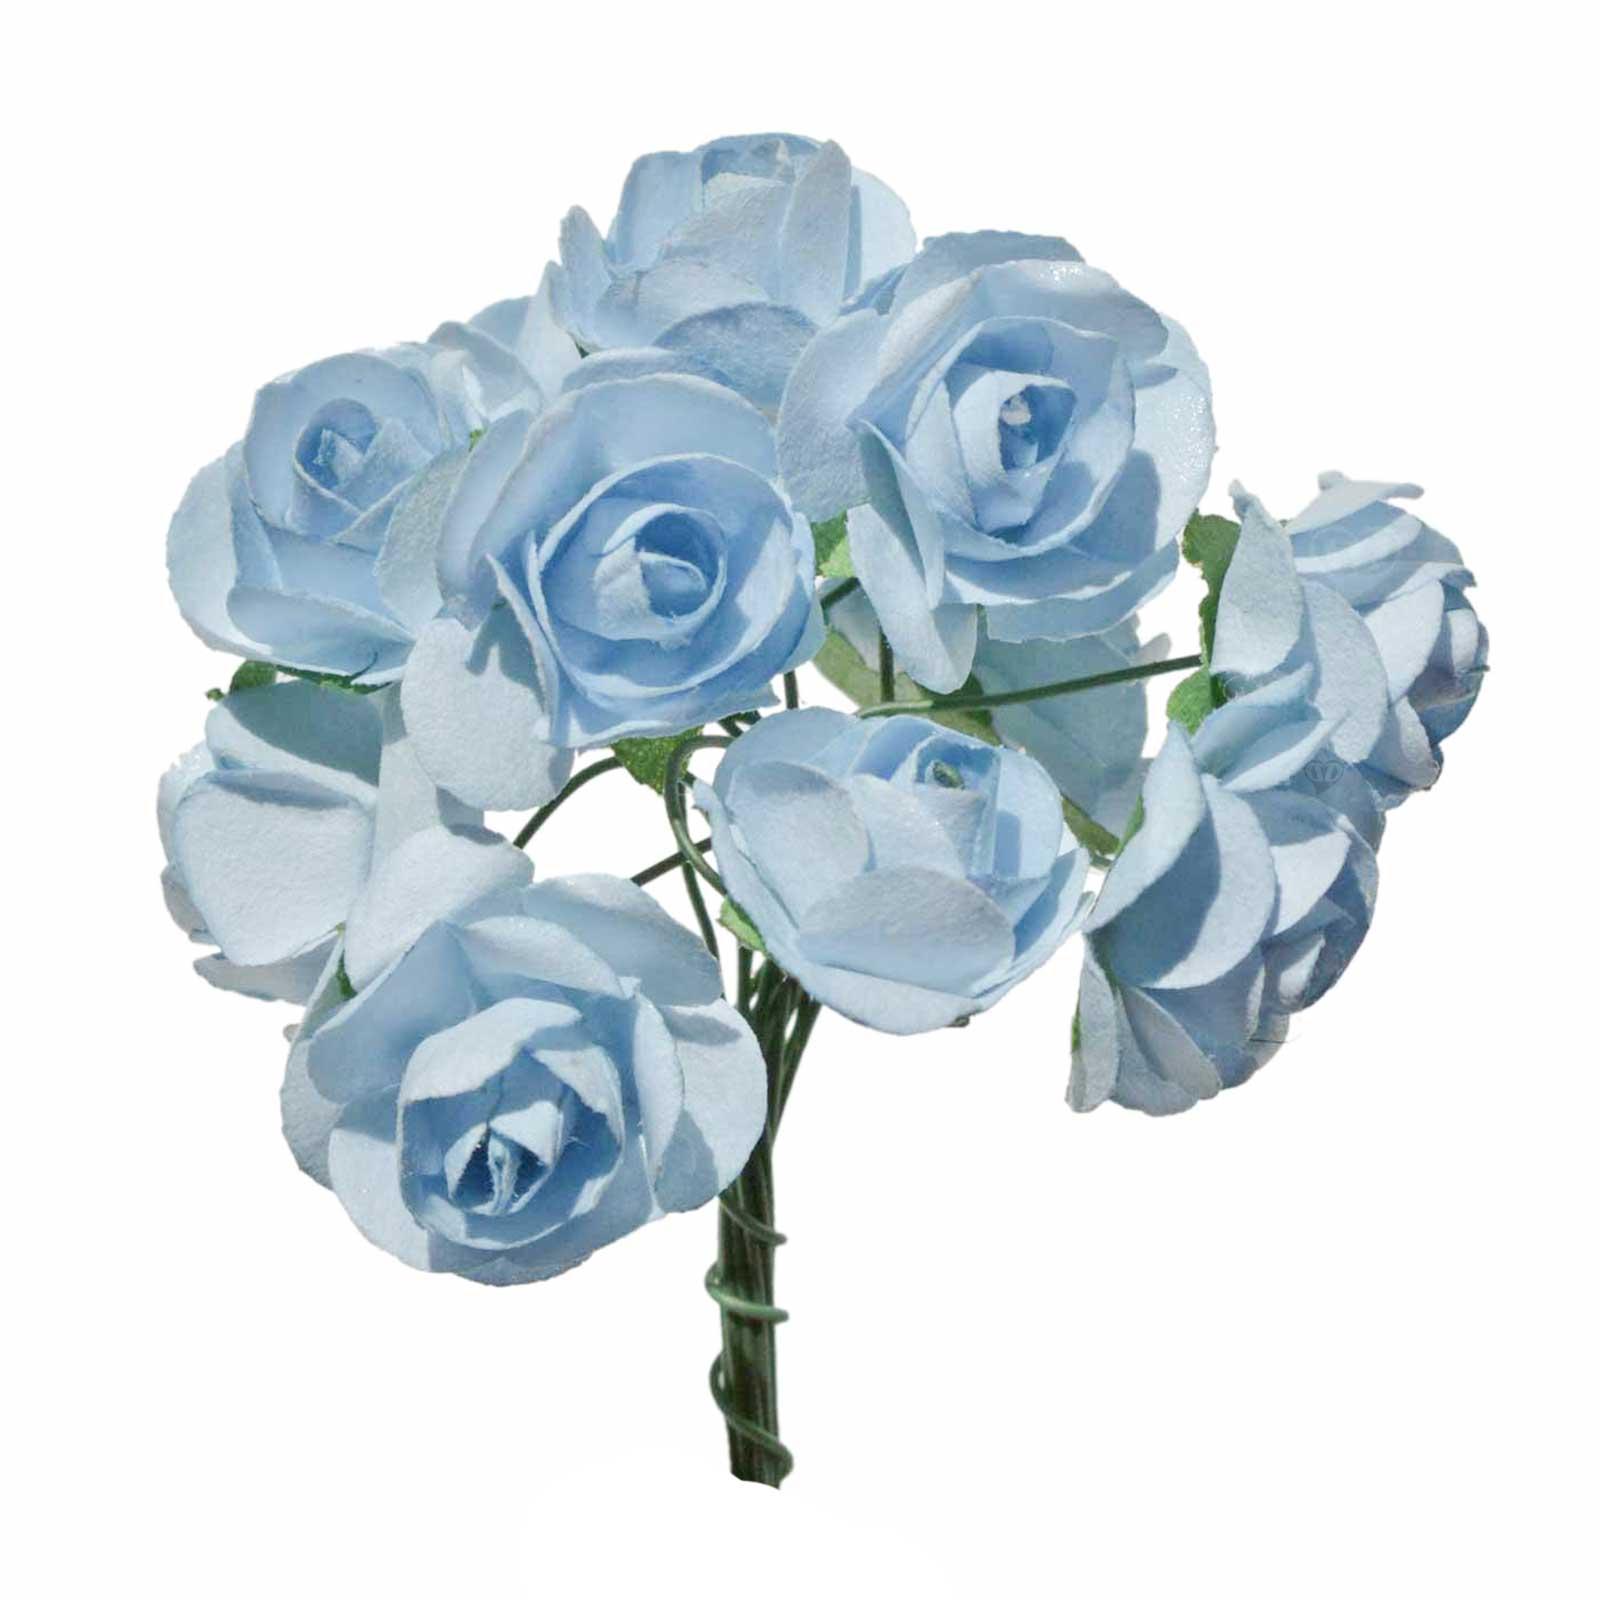 1 Bündel je 12 Rosen Röschen, Länge 7cm, Dekoration, Floristik, Farbe wählbar – Bild 3